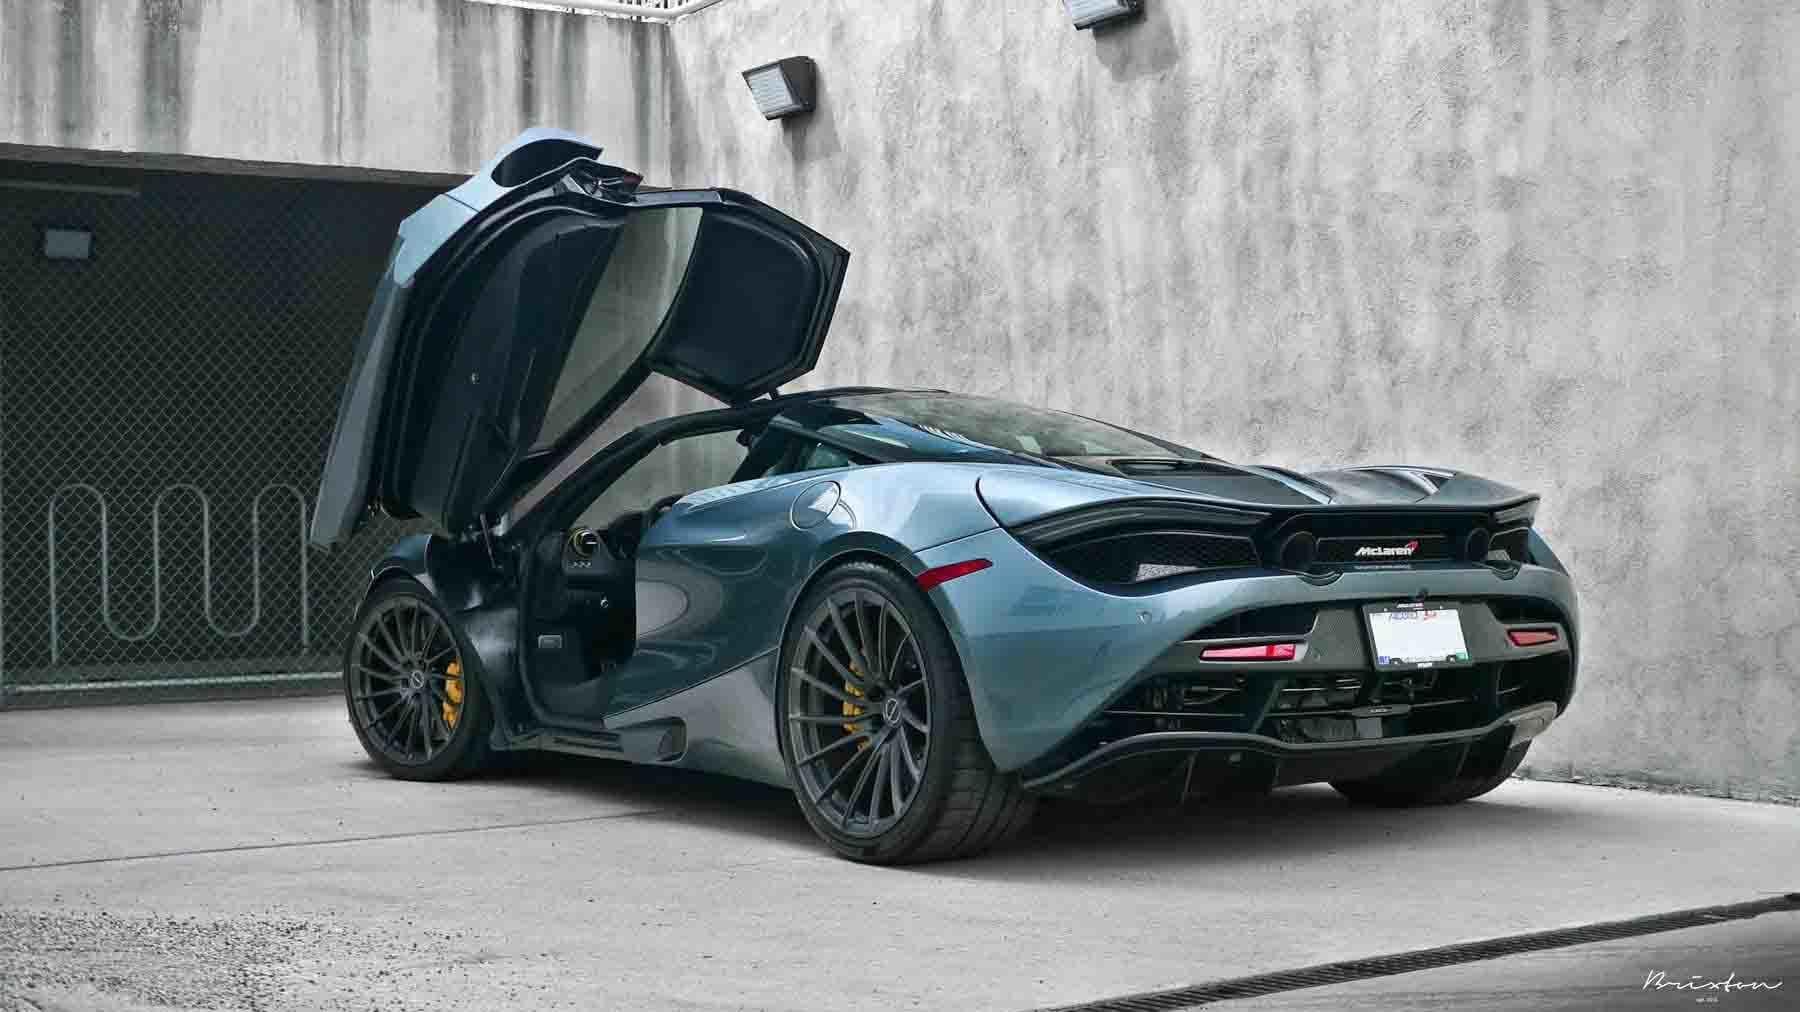 images-products-1-2923-232975211-polaris-blue-mclaren-720s-performance-brixton-forged-wheels-r15-ultrasport-1-piece-concave-brush.jpg